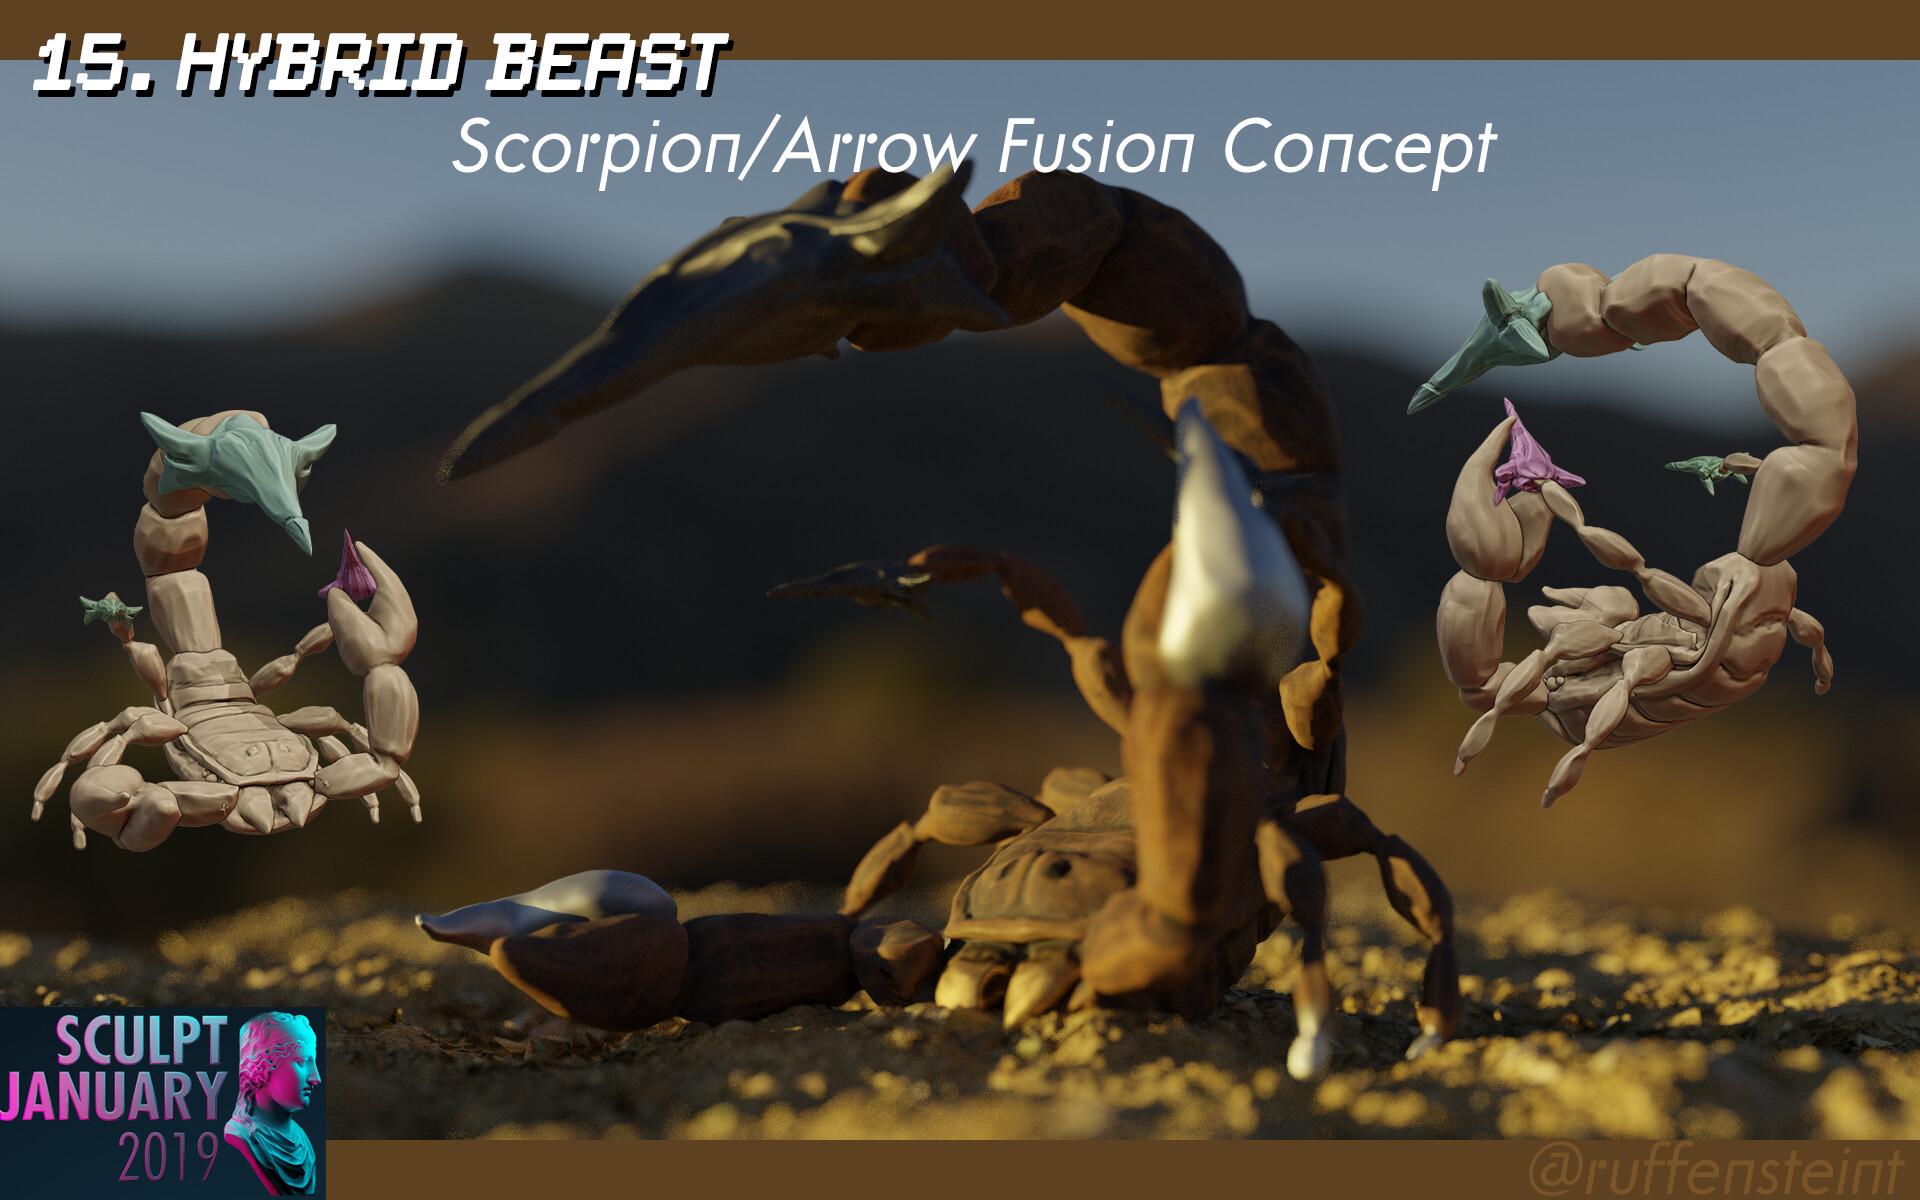 Kris hyde 15 hybrid beast